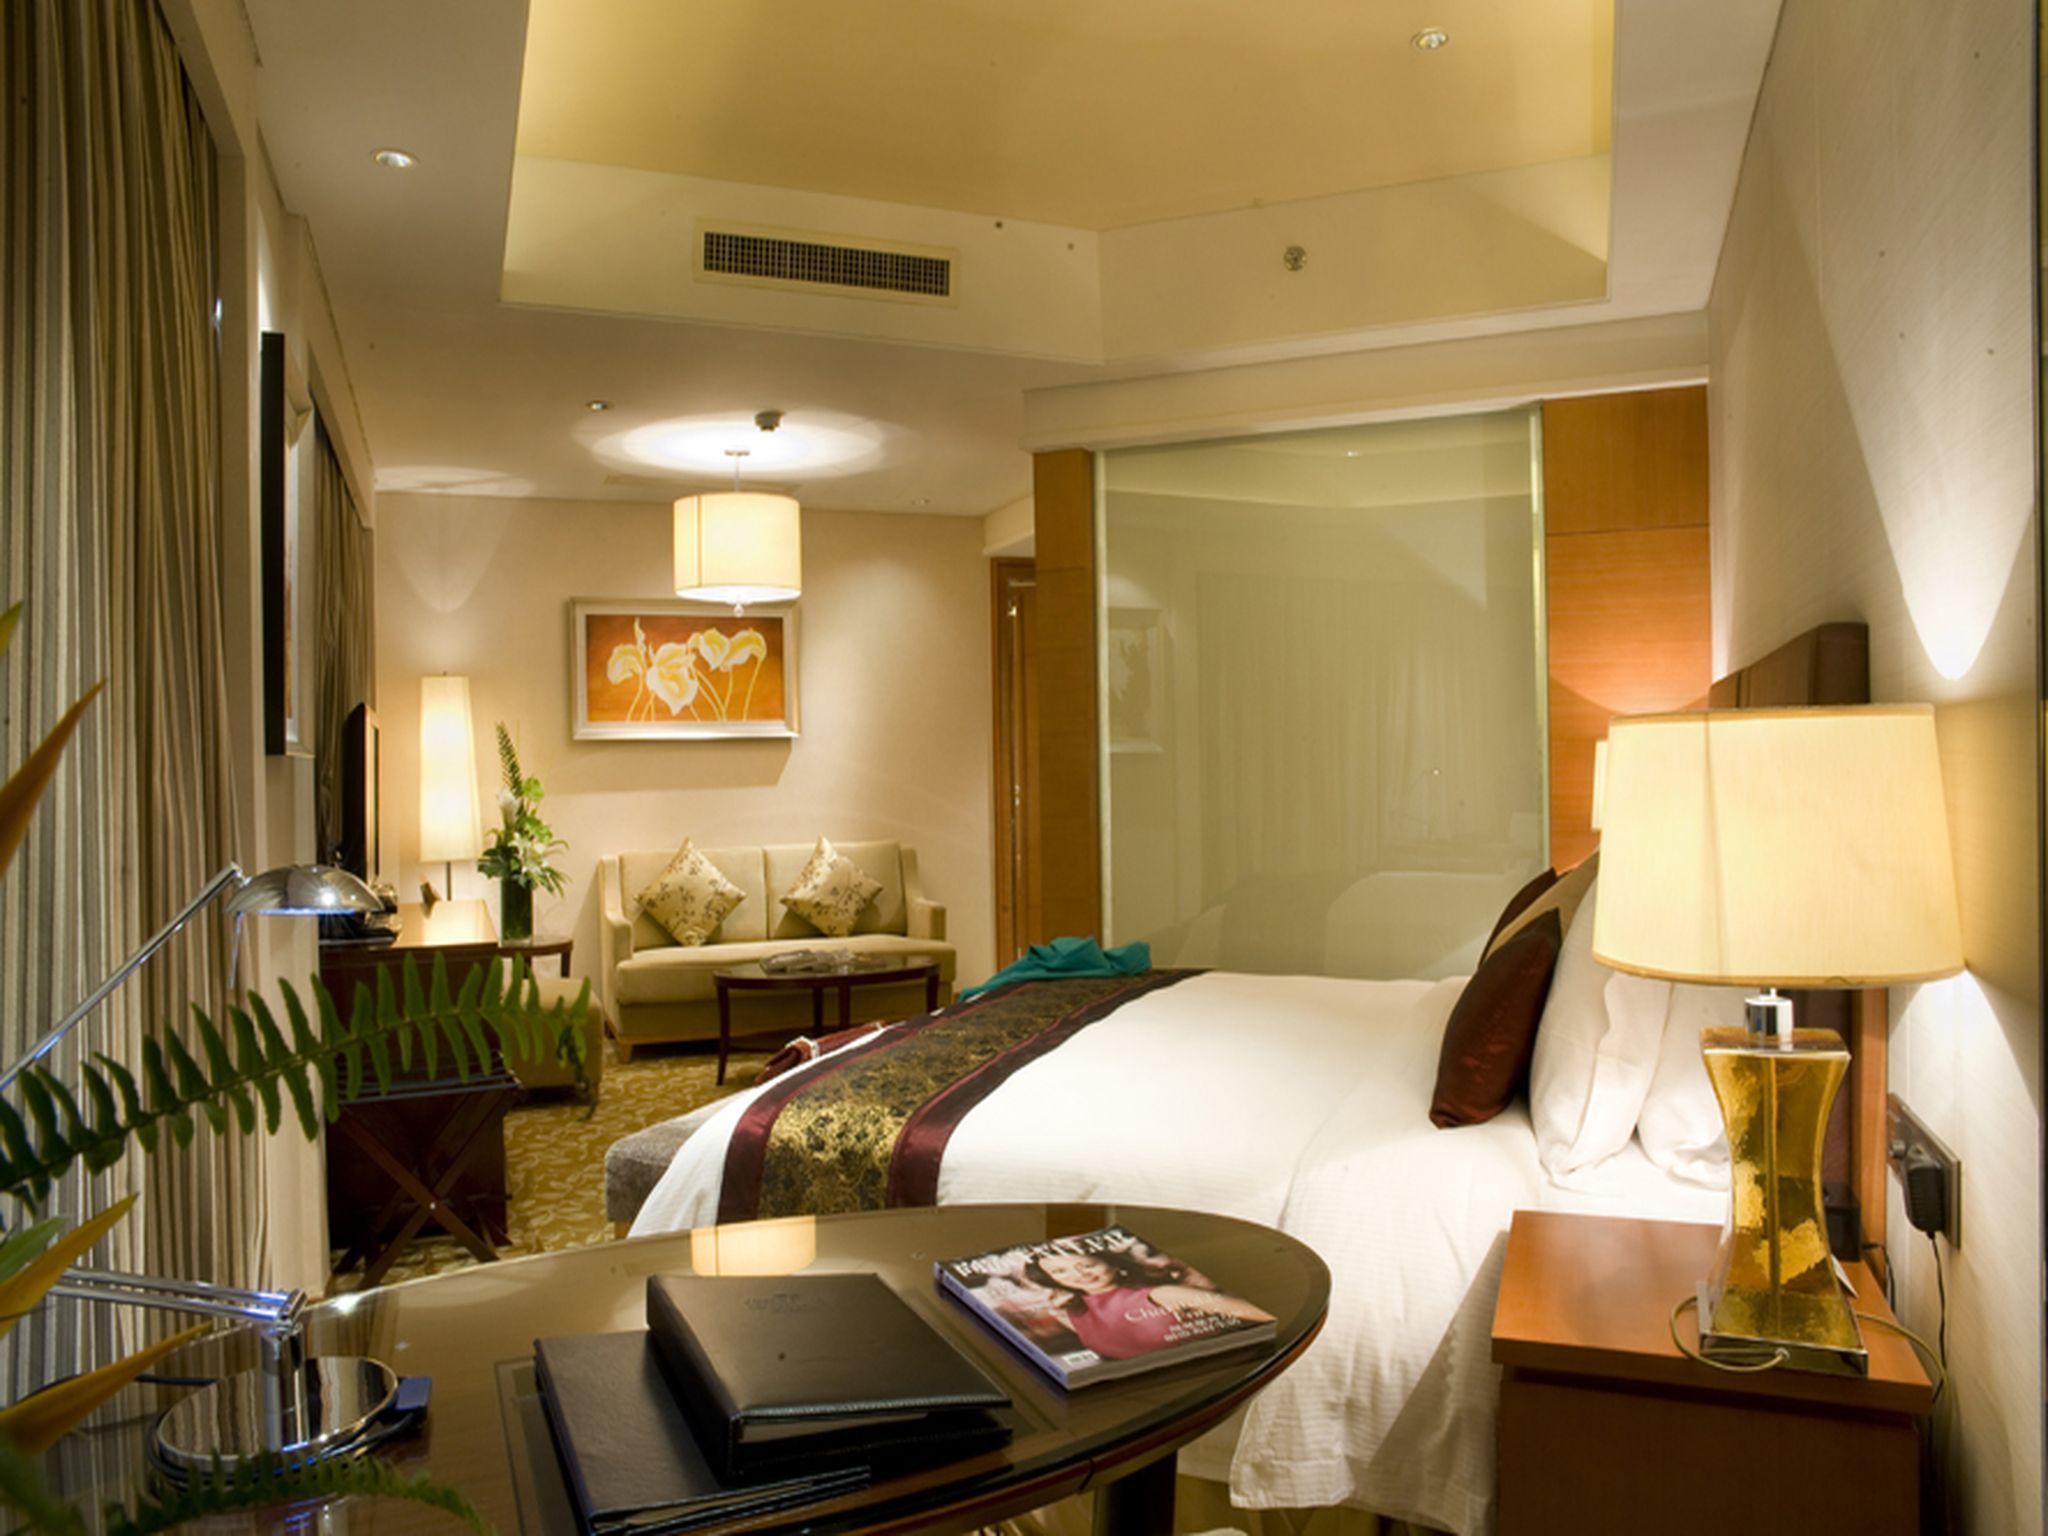 Shanghai Koya International Hotel In China